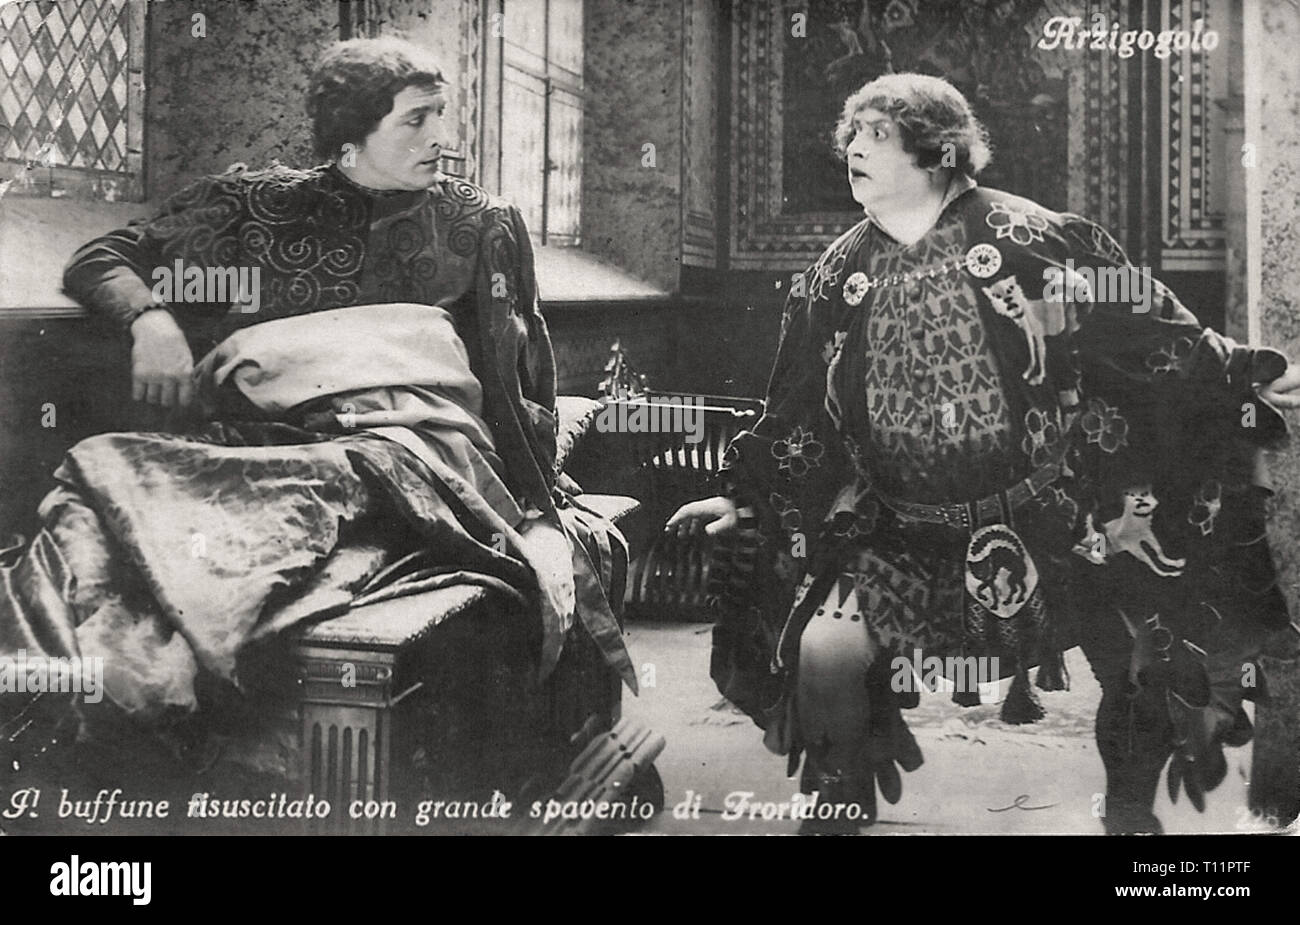 Promotional photography of Annibale Betrone and Oreste Bilancia in L'arzigogolo - Silent movie era - Stock Image